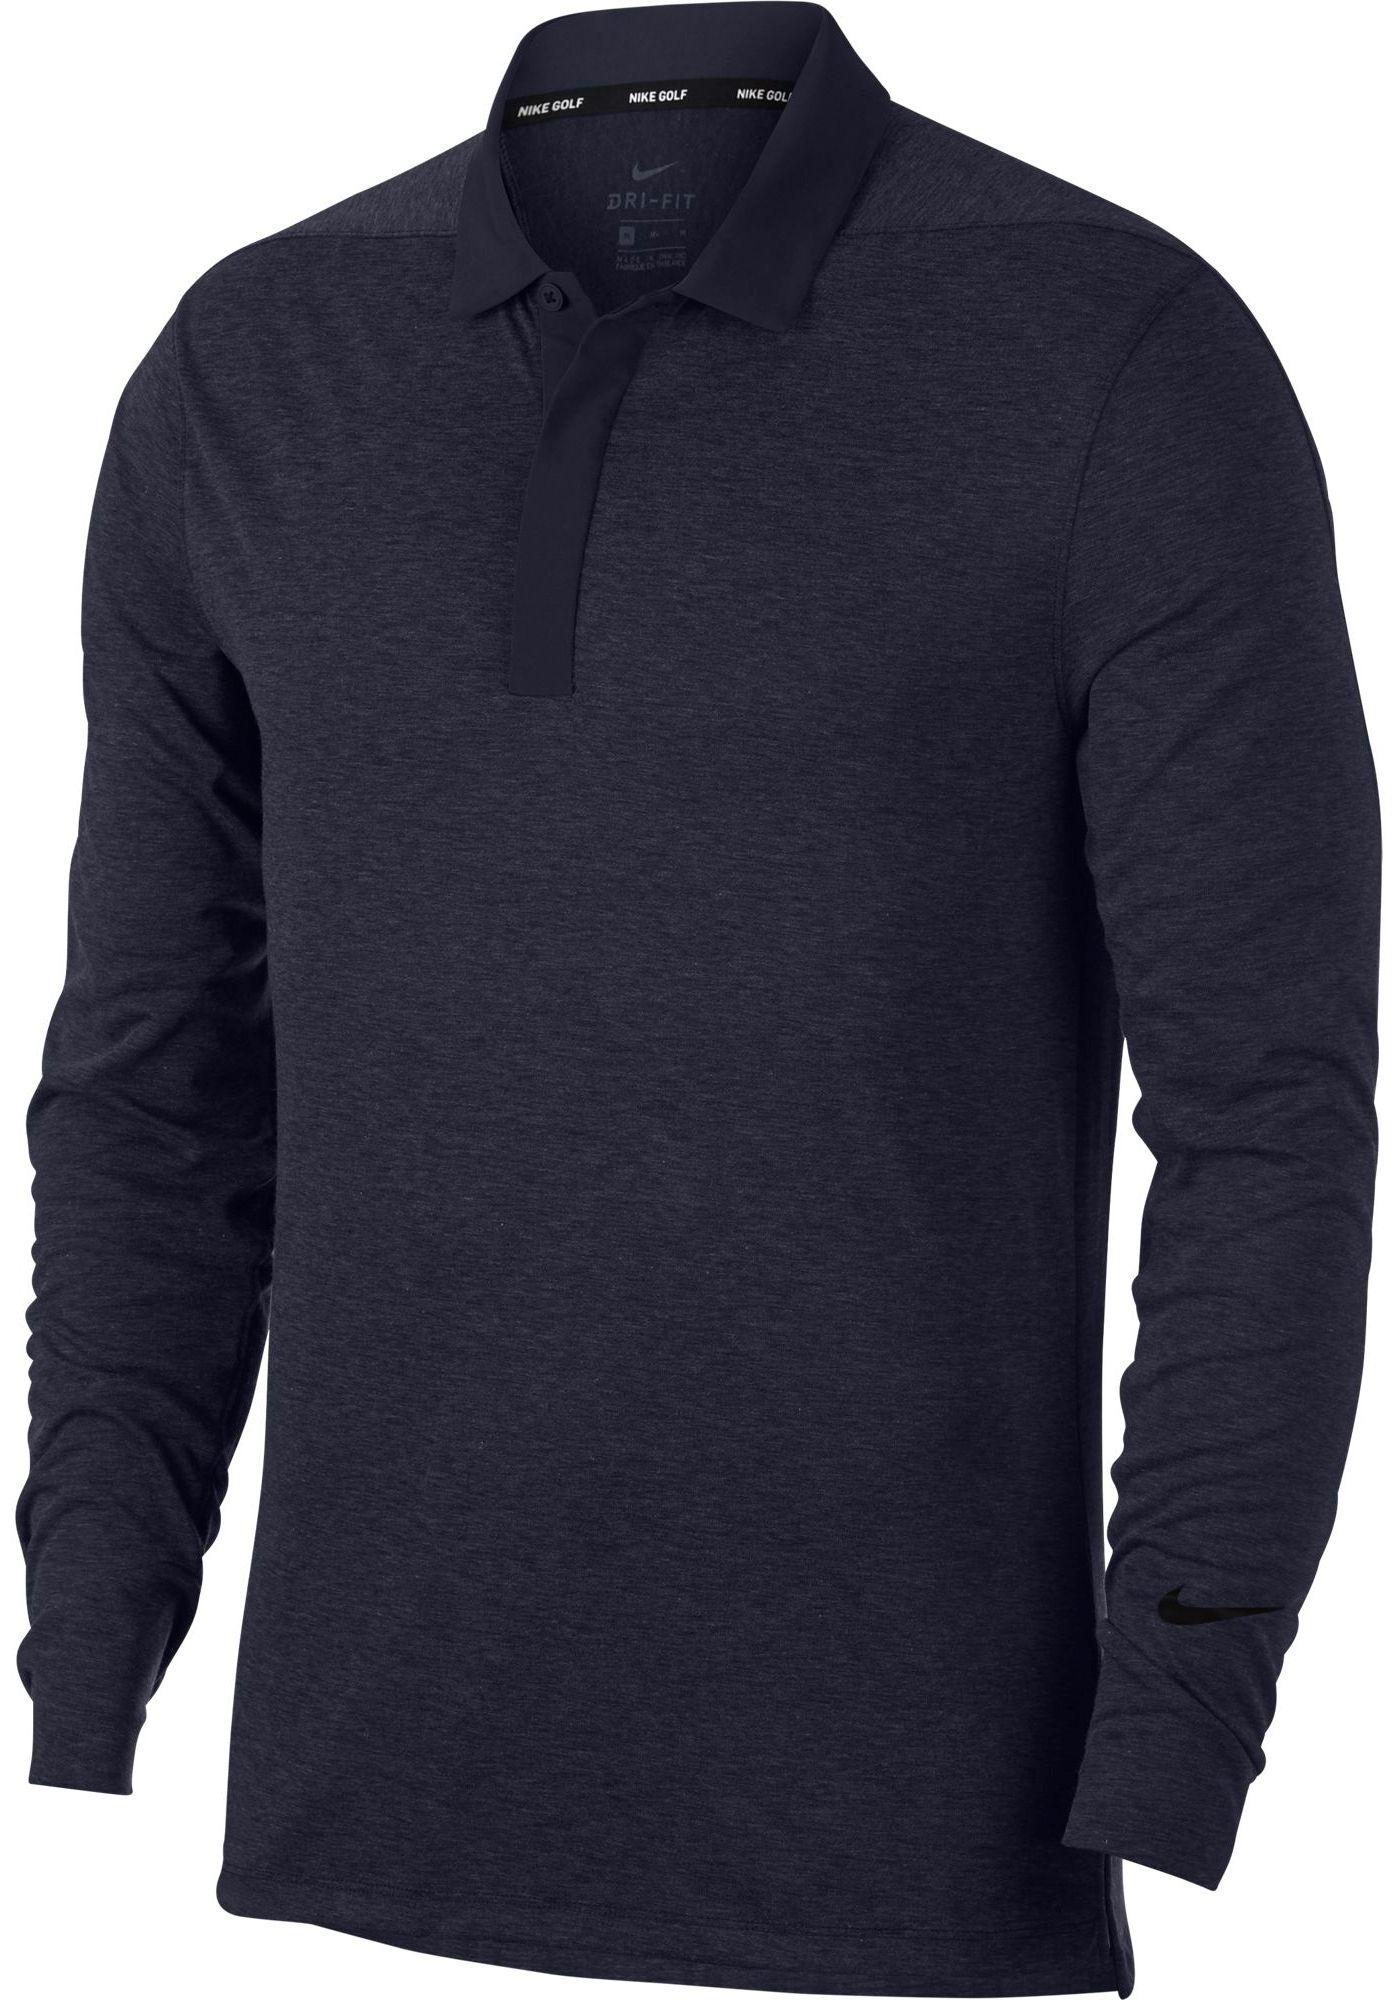 Nike Men's Long Sleeve Golf Polo